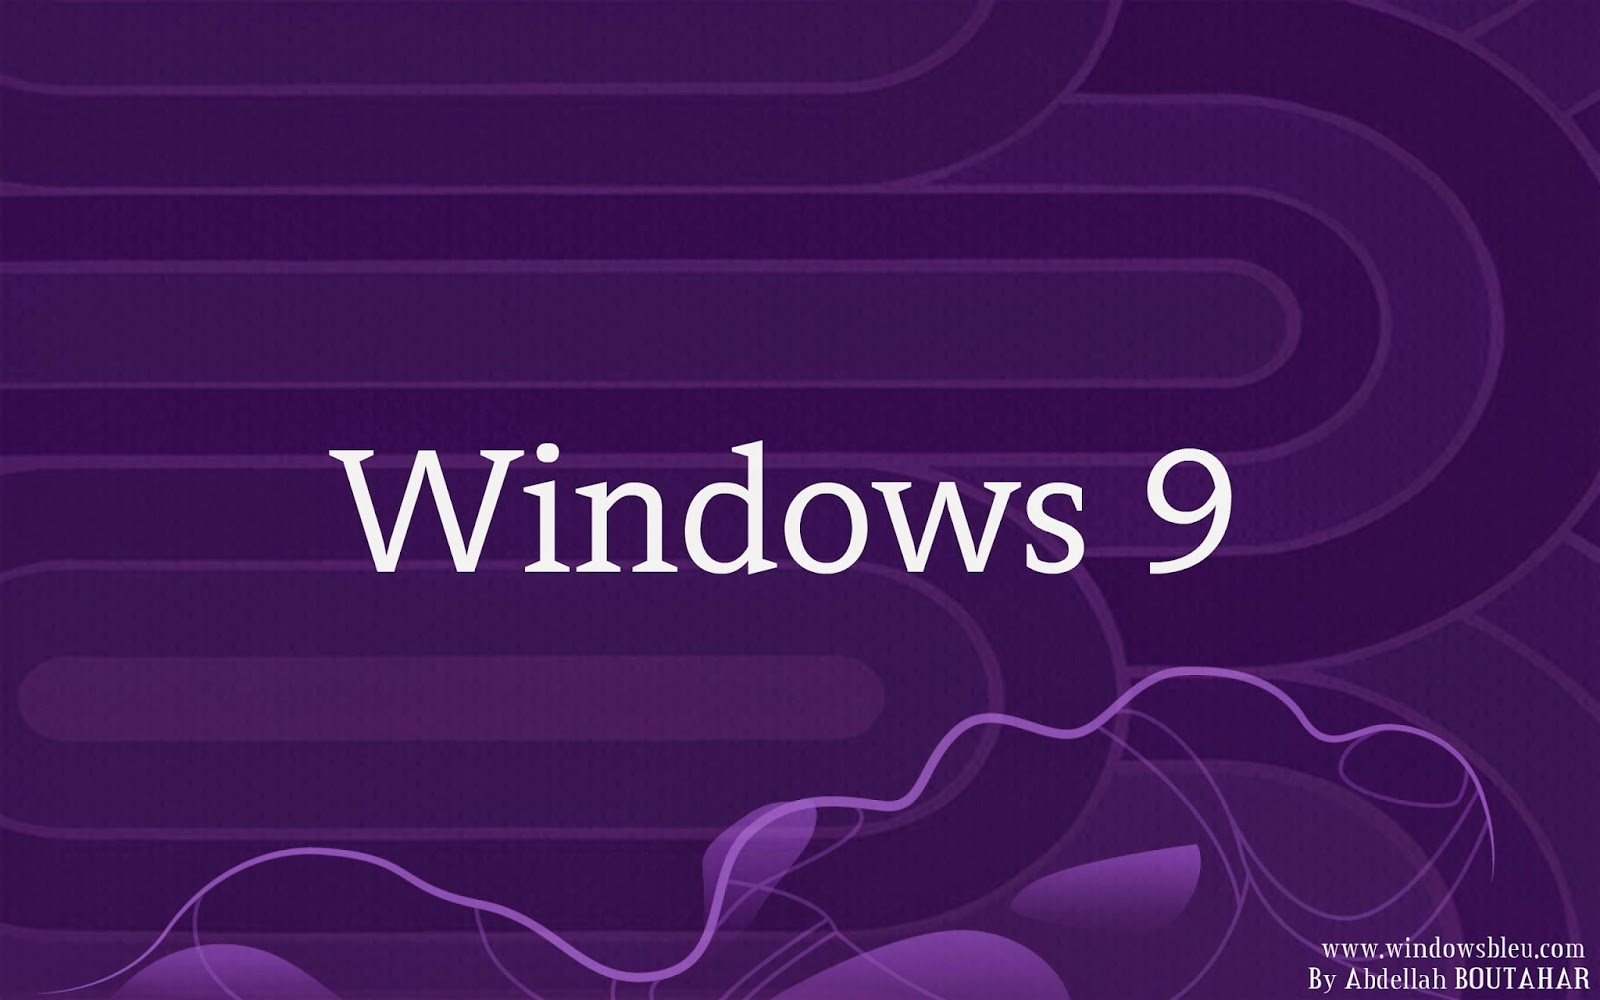 Windows 9 Wallpaper